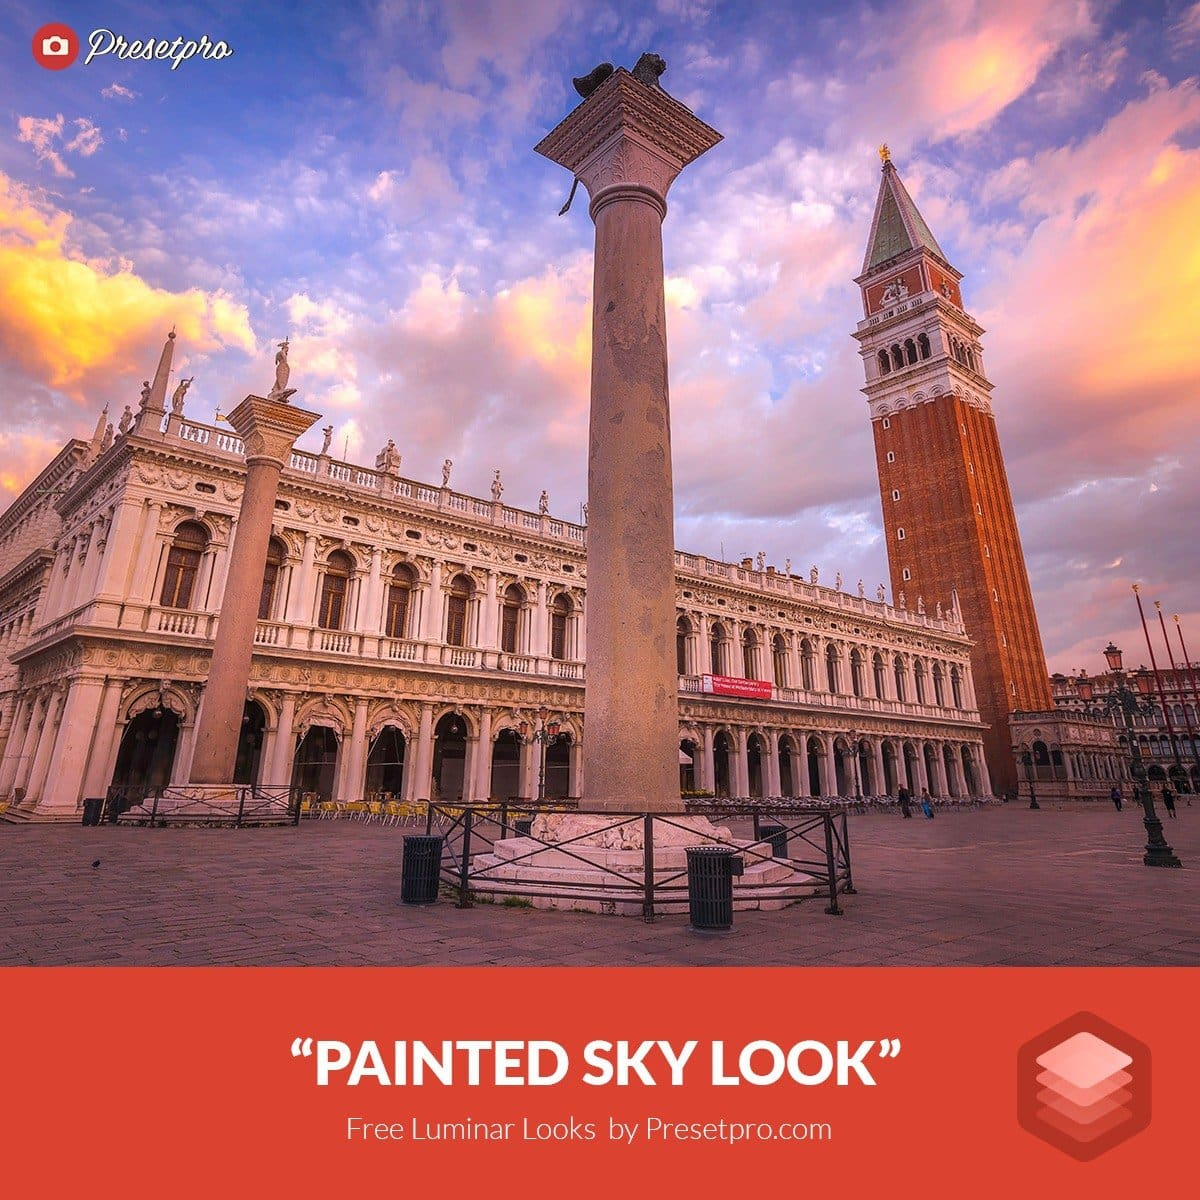 Free-Luminar-Look-Preset-Painted-Sky-by-Presetpro.com